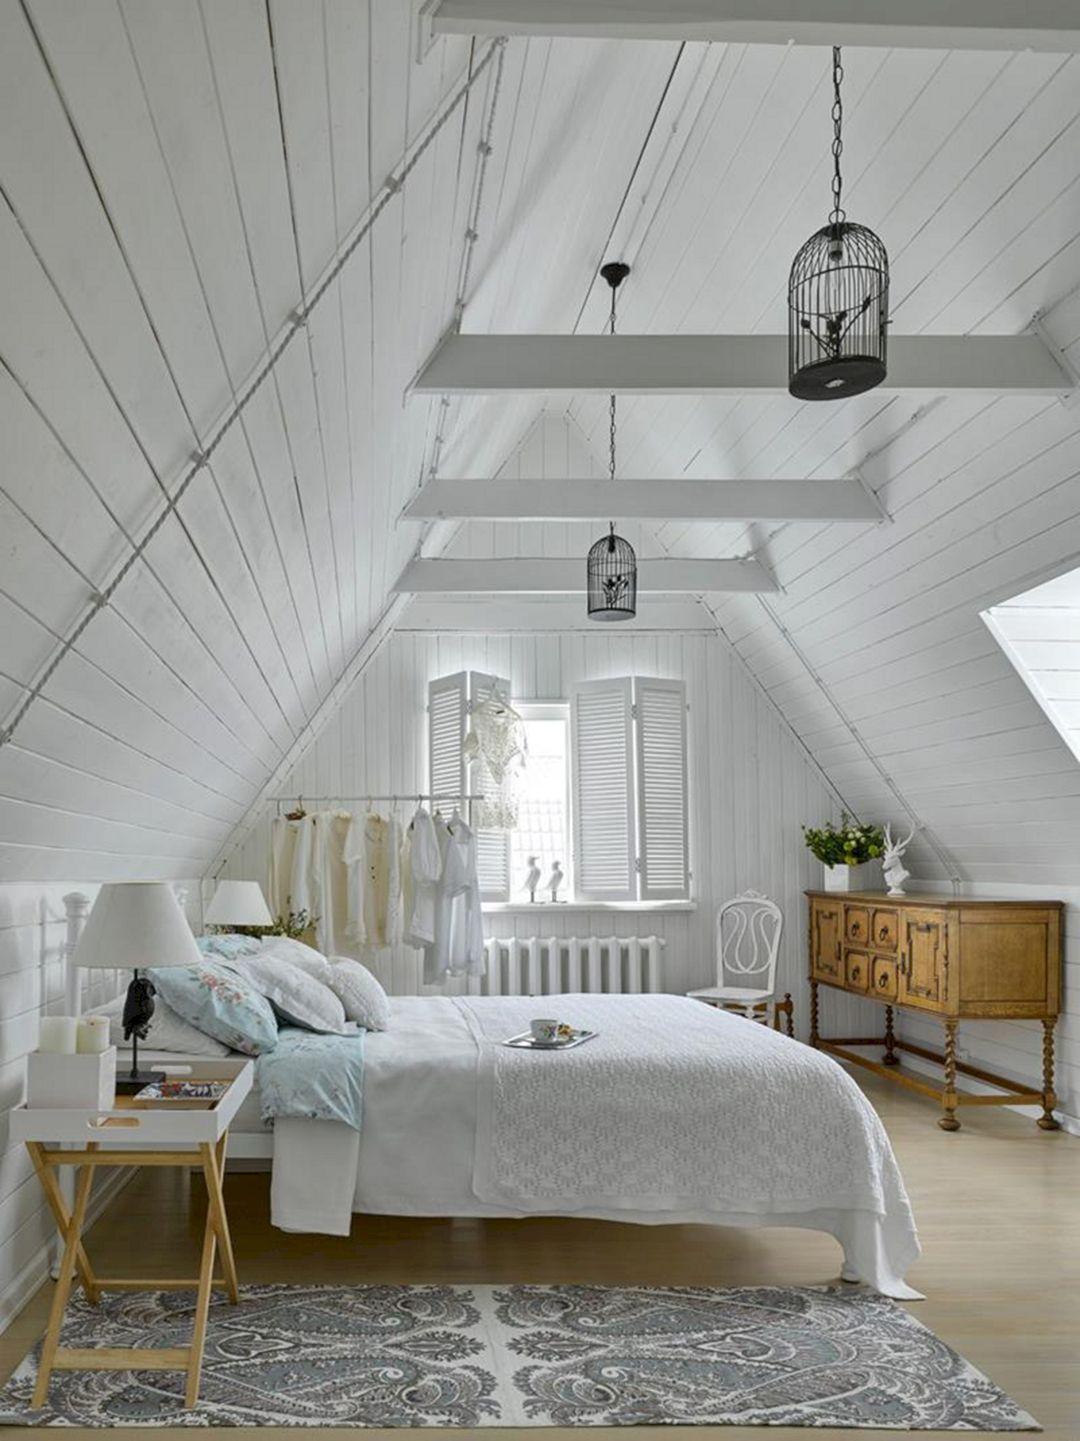 35 Gorgeous Attic Master Bedroom Ideas On A Budget Freshouz Com Chic Bedroom Design Attic Master Bedroom Shabby Chic Decor Bedroom